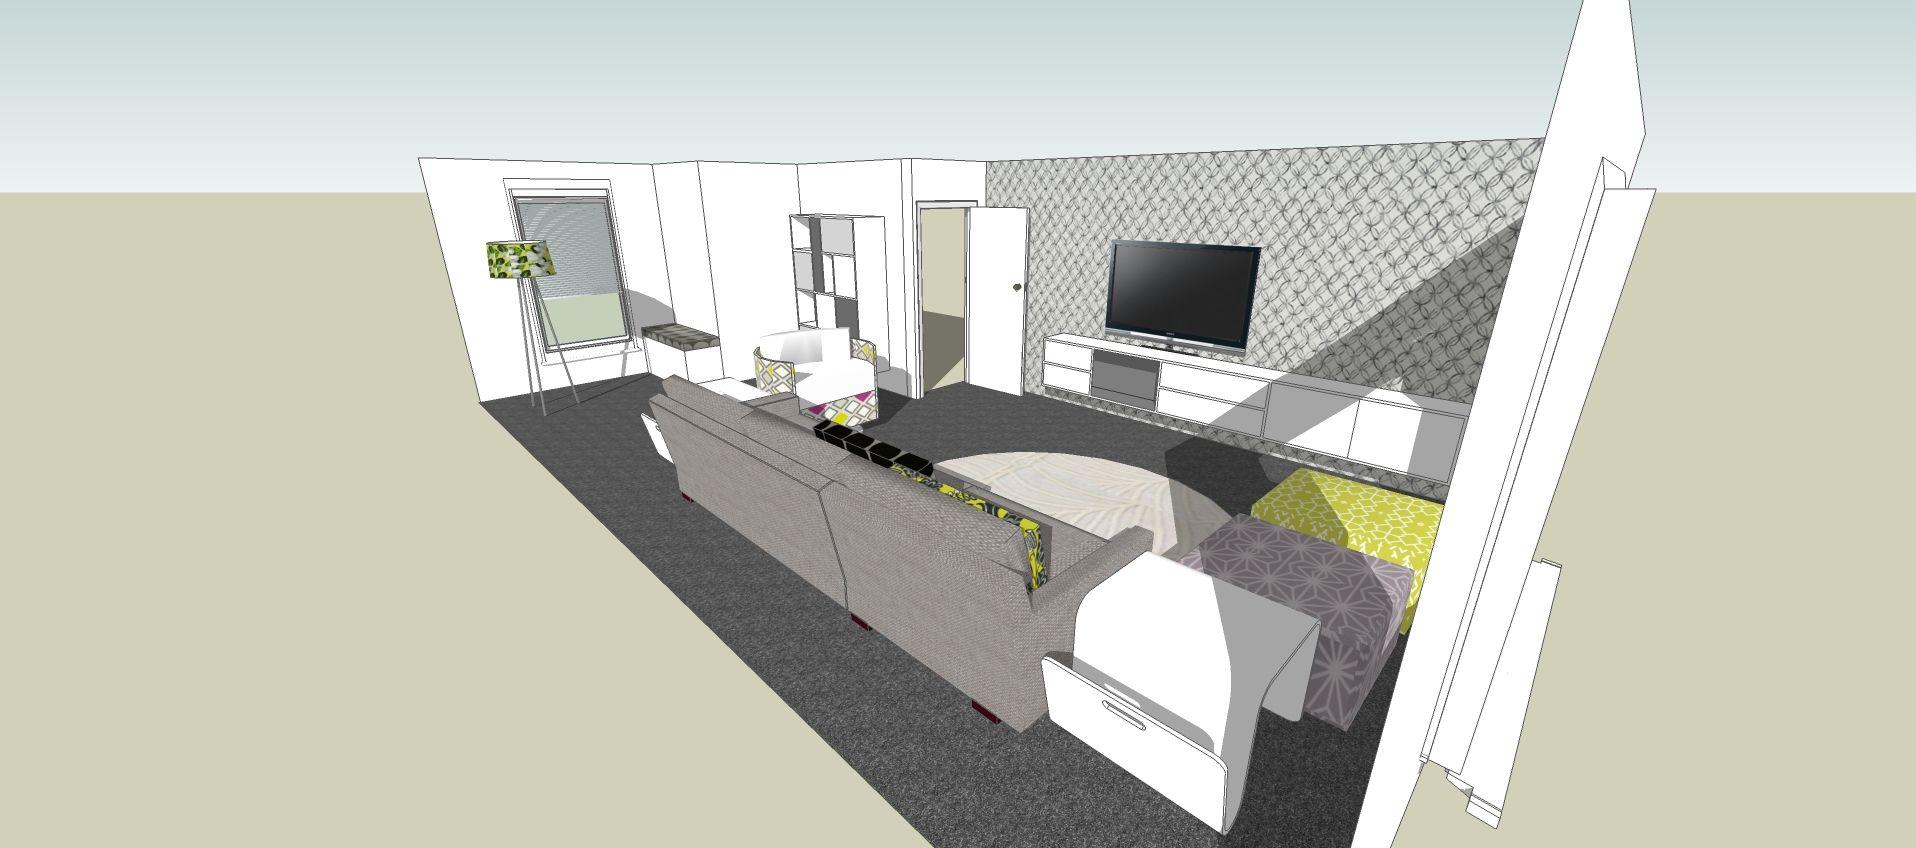 SketchUp Lounge Area | Digital Models | Pinterest | Lounge areas